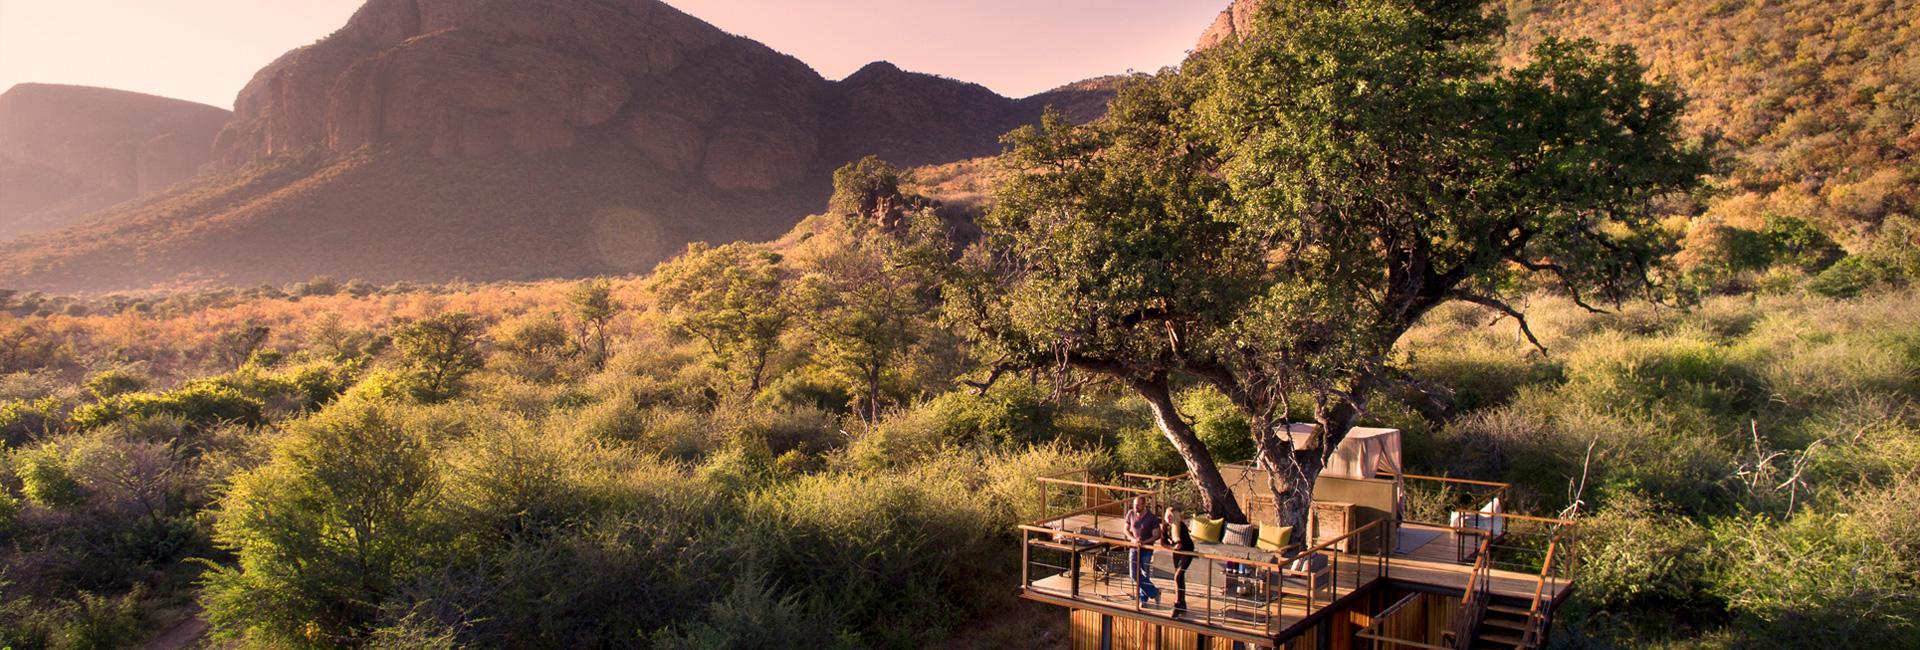 Luxury Yoga Retreats - Marataba, South Africa Retreat